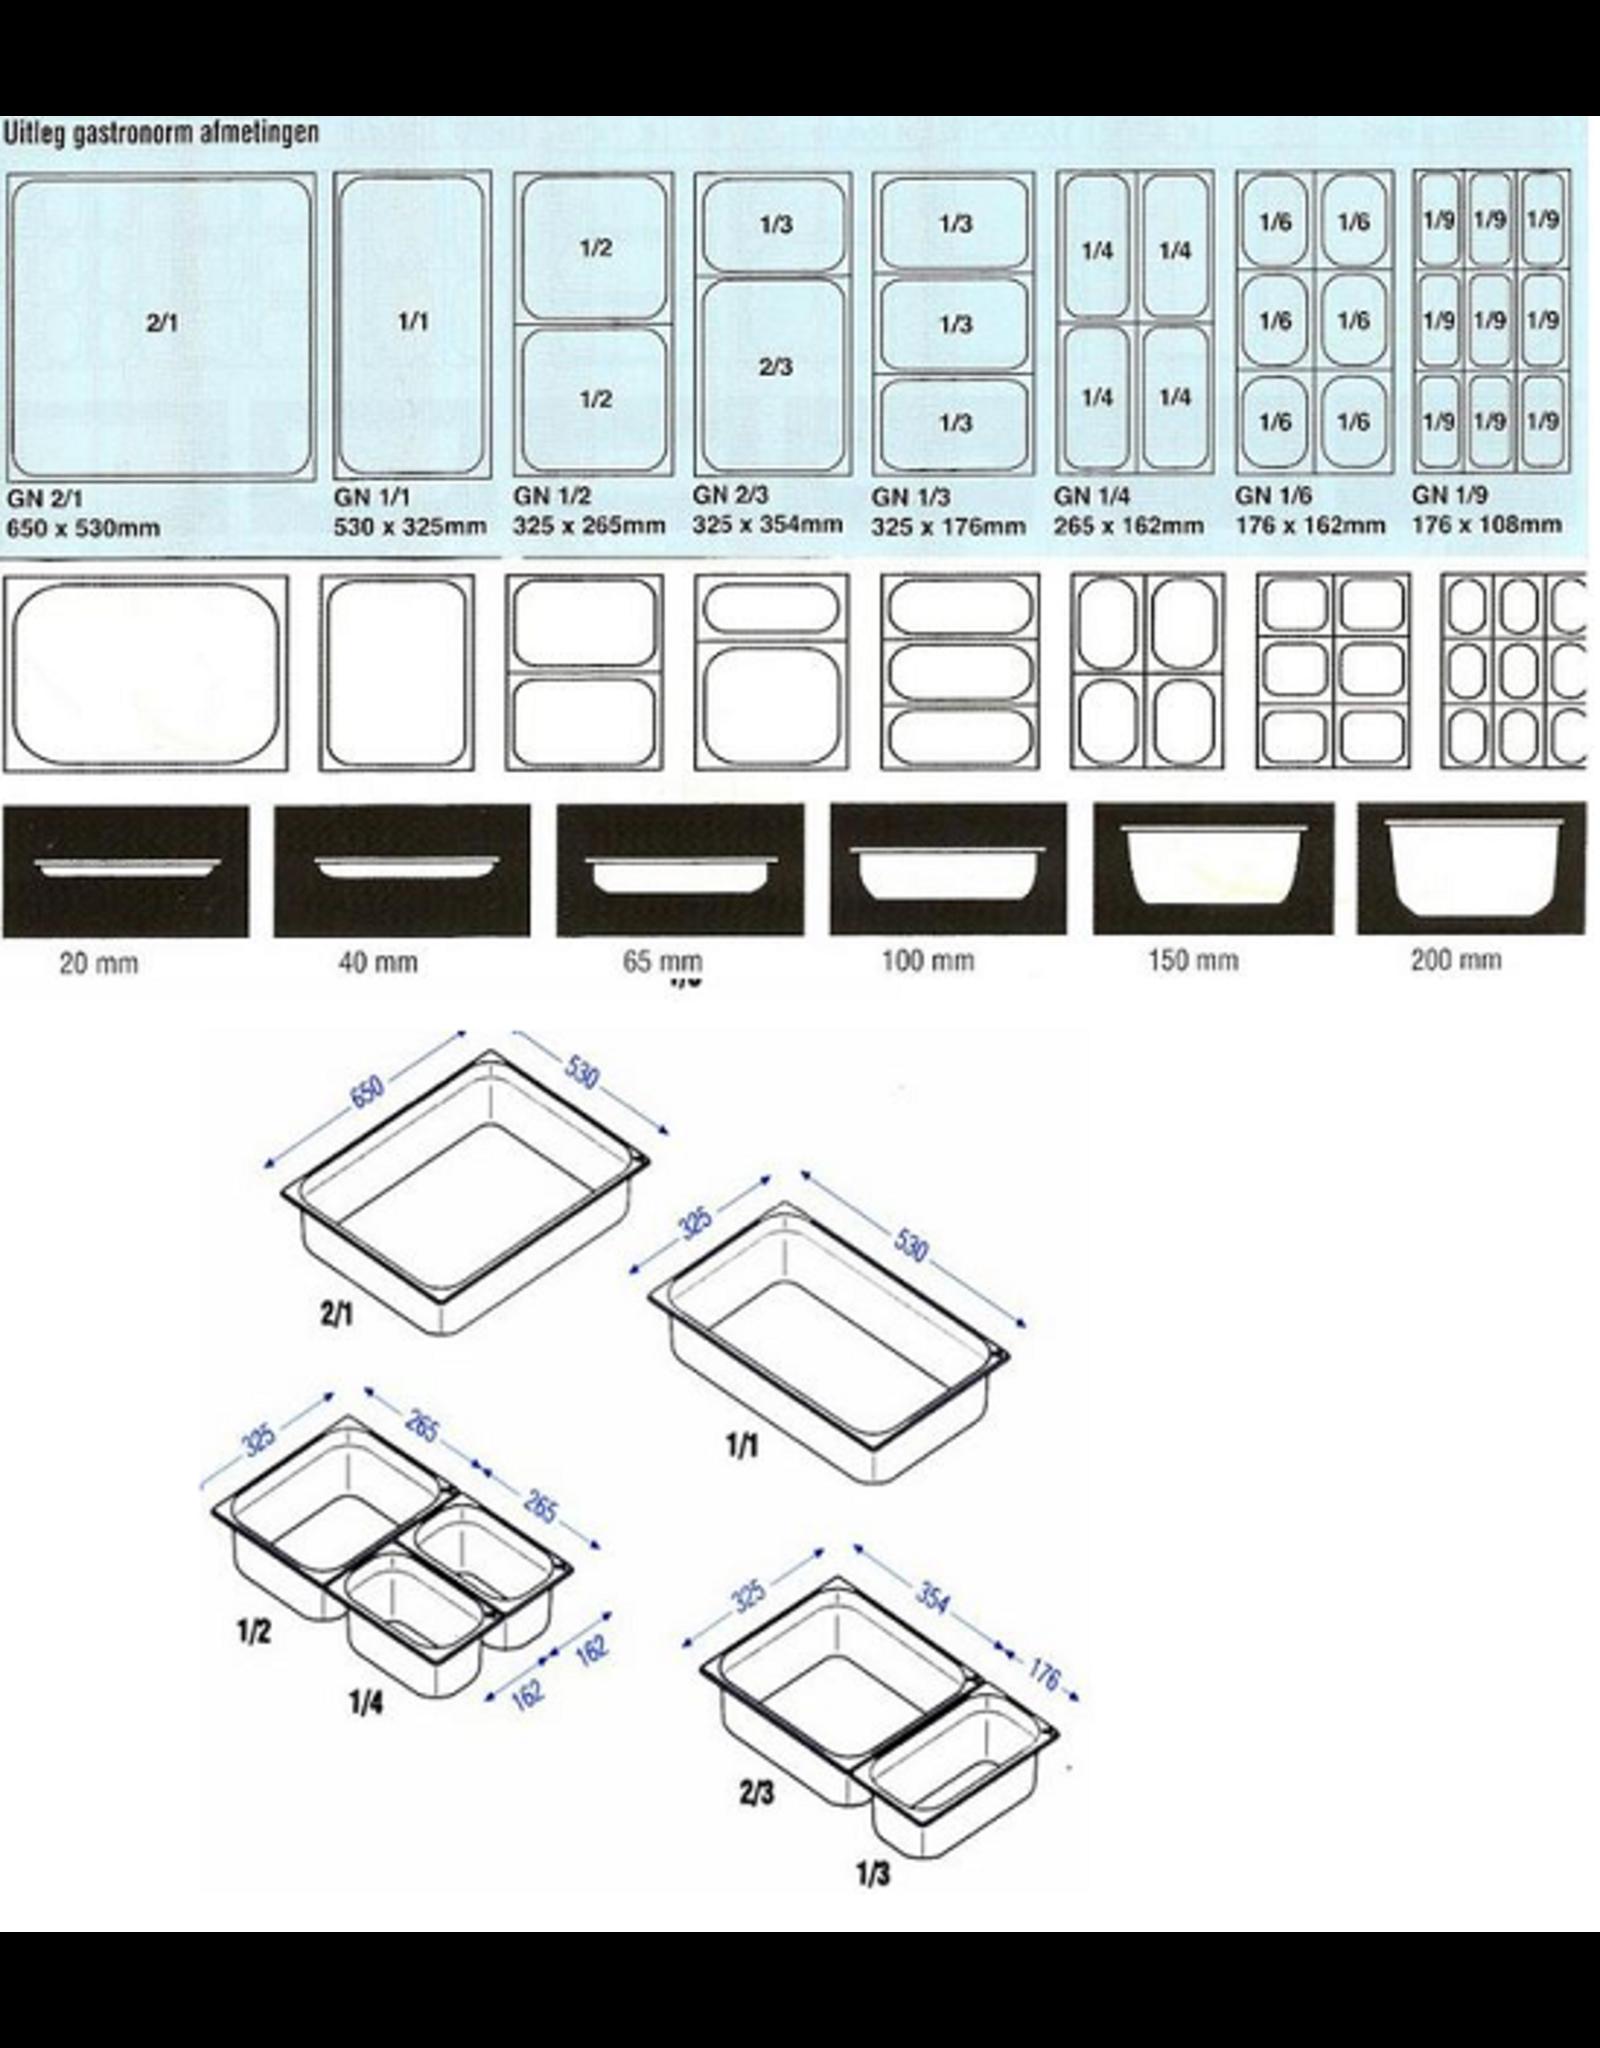 Q-Gastro Gastronorm Bak RVS 1/1GN | 20mm | 530x325mm